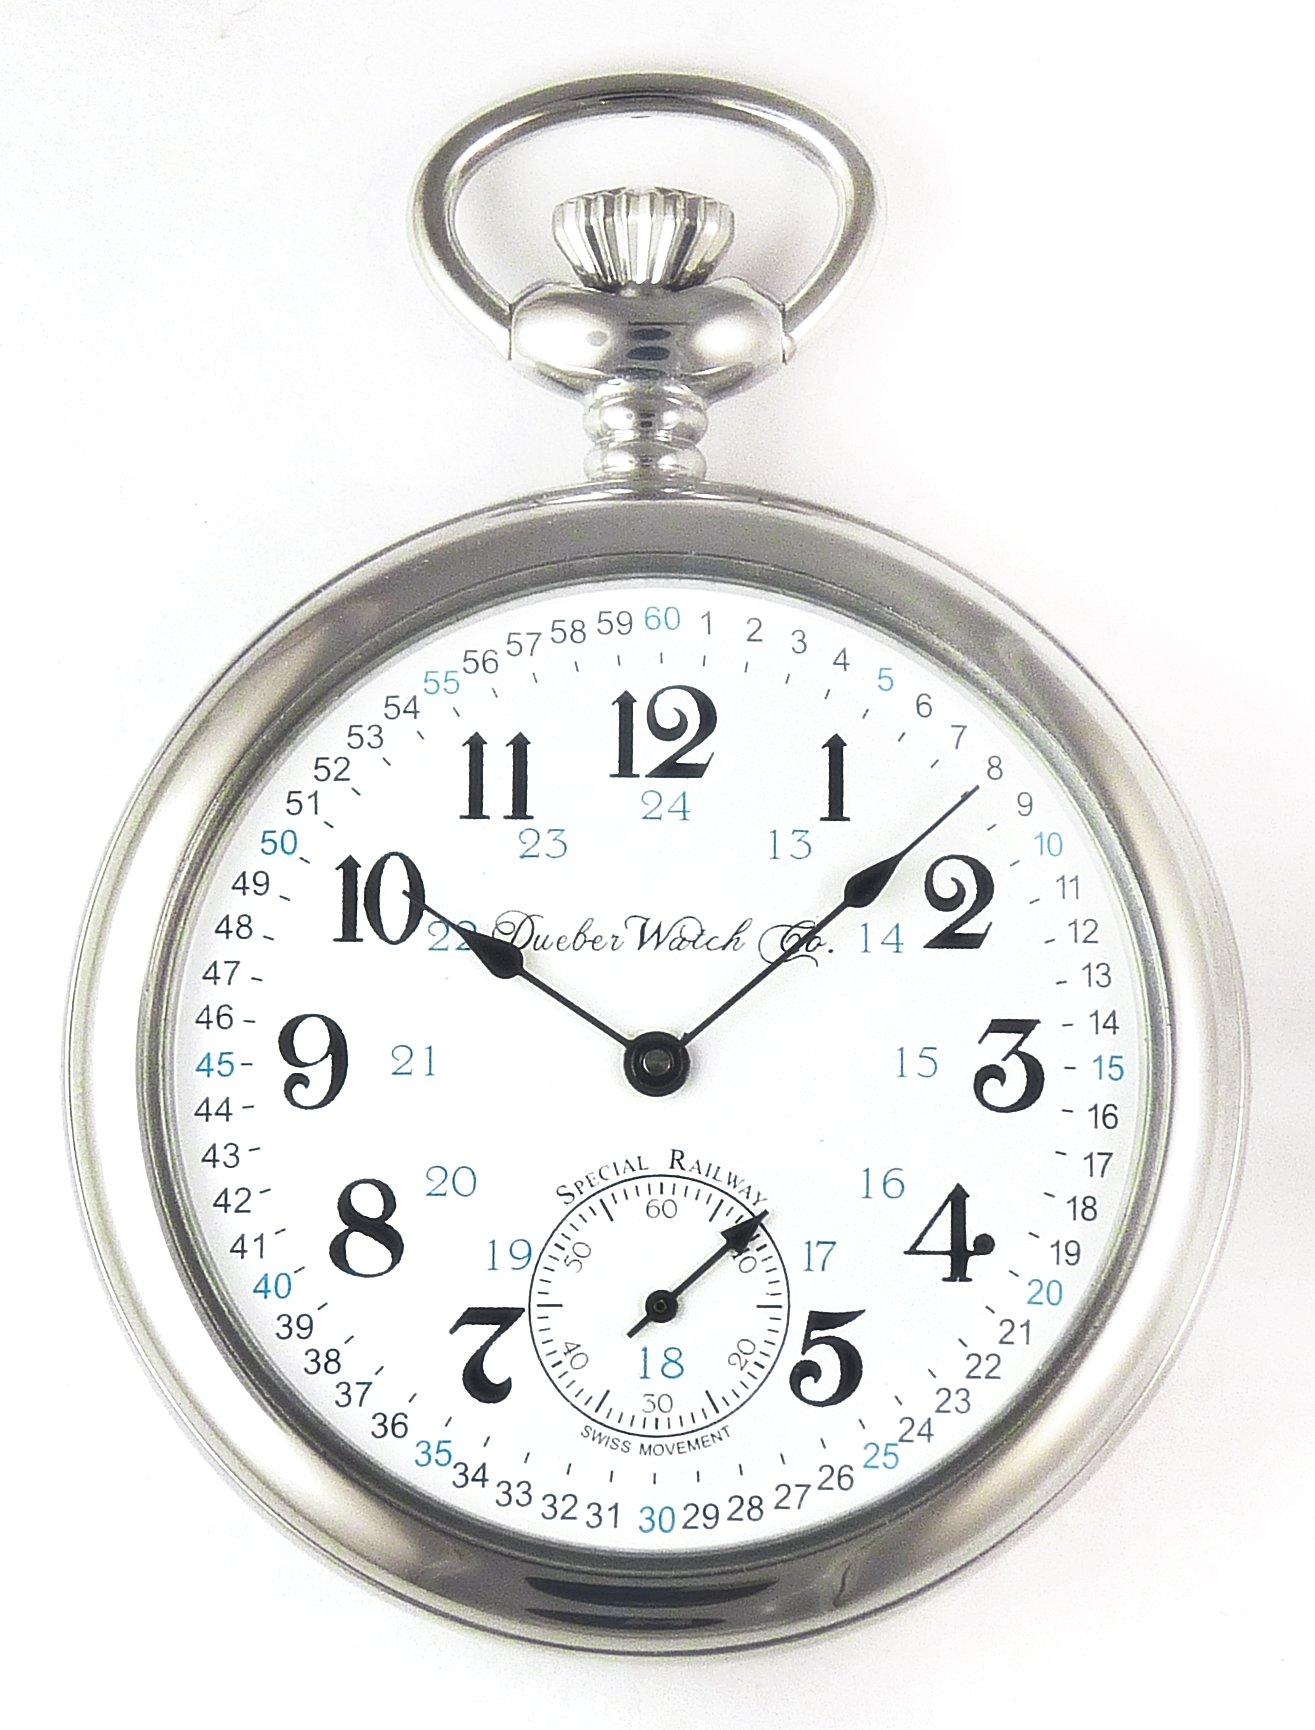 Dueber Special Railway Swiss Mechanical Pocket Watch High Polish Chrome Open Face Case - USA!